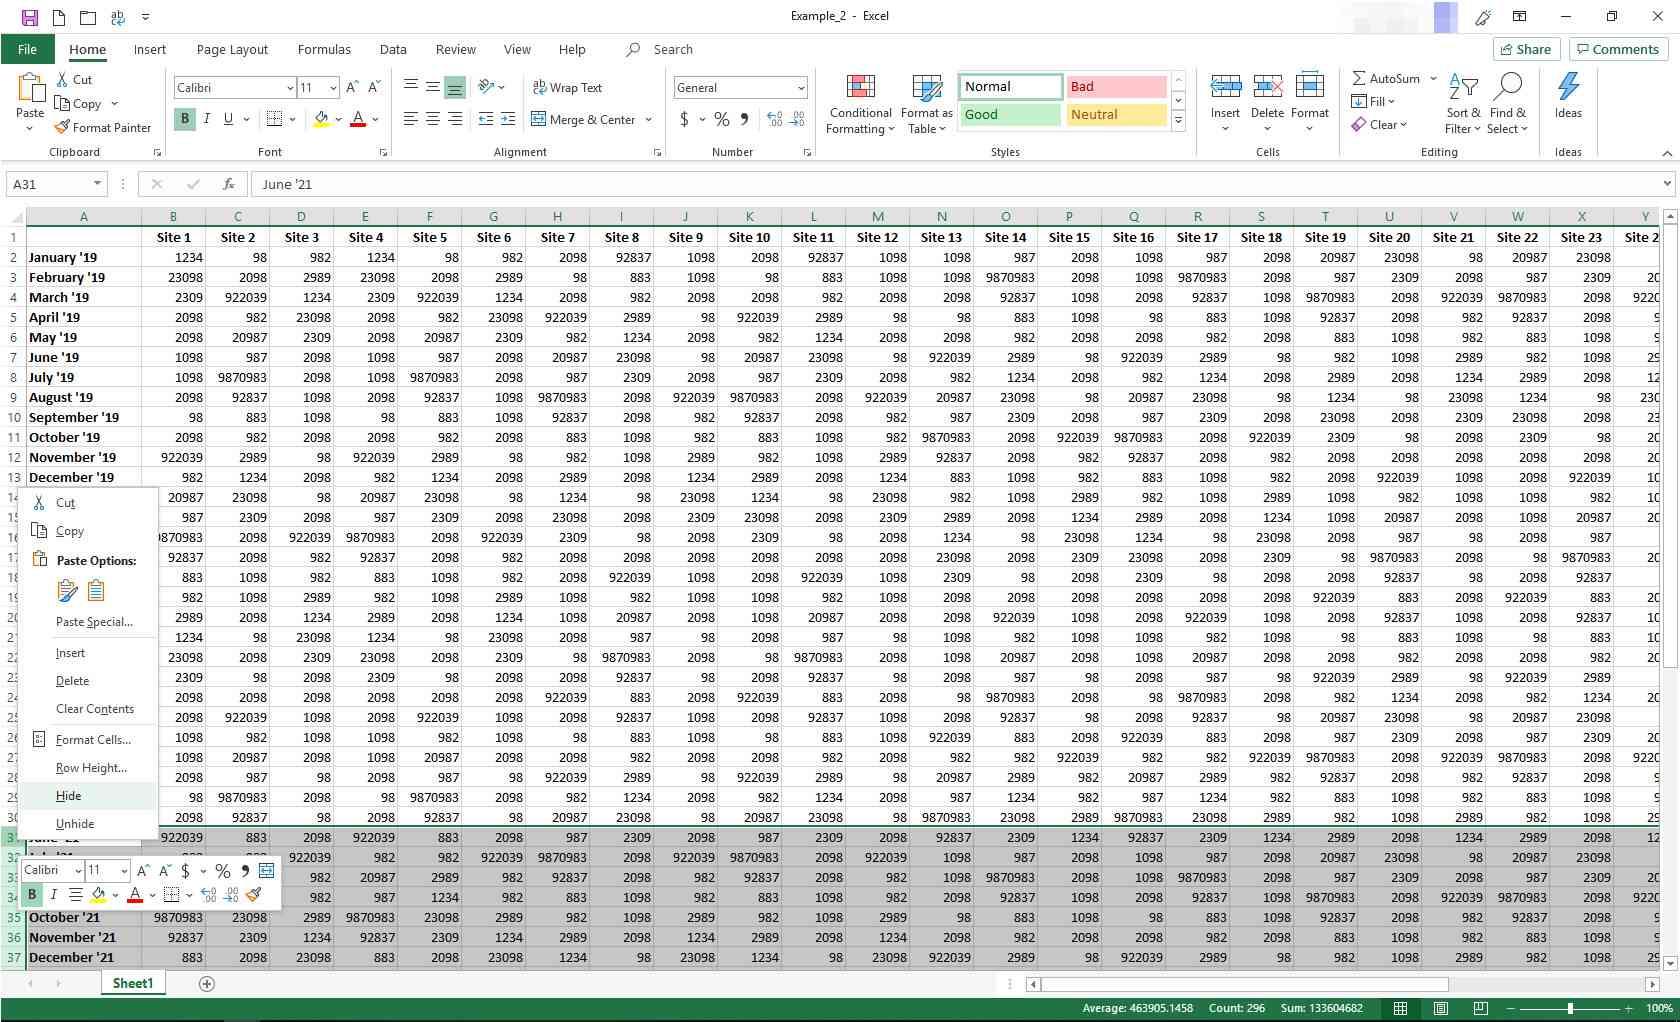 Excel with contextual menu displayed